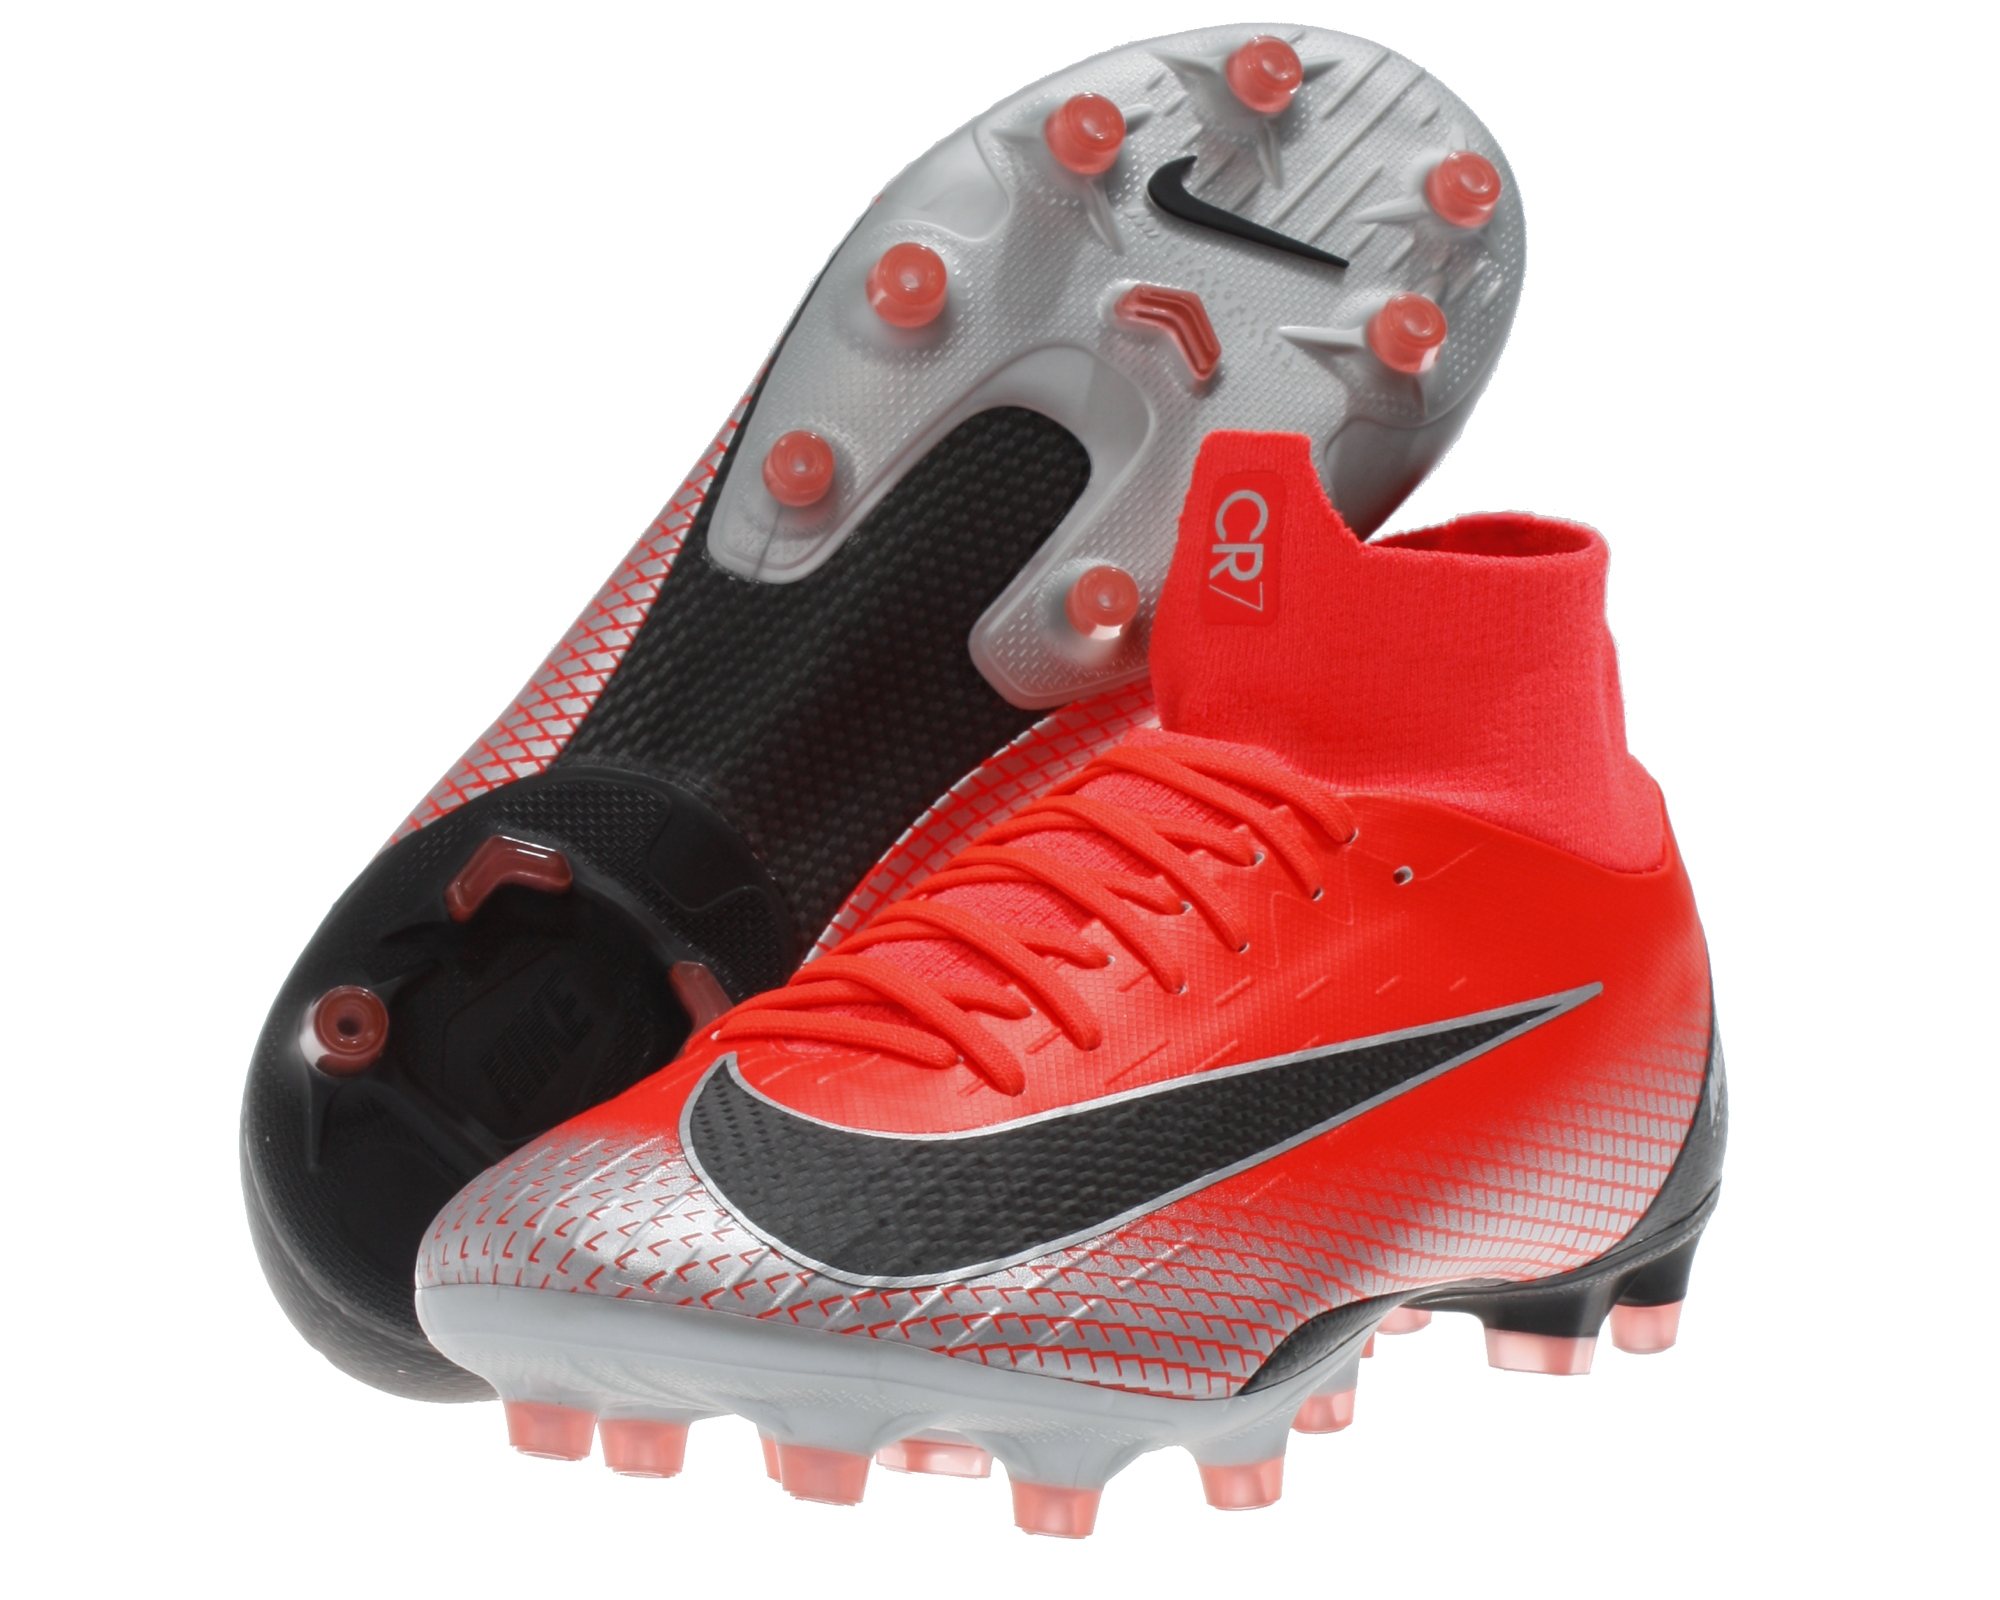 competitive price ef0d1 296cd Nike Herren Fußball-Schuhe CR7 Mercurial Superfly VI PRO AG-Pro Kunstrasen  rot